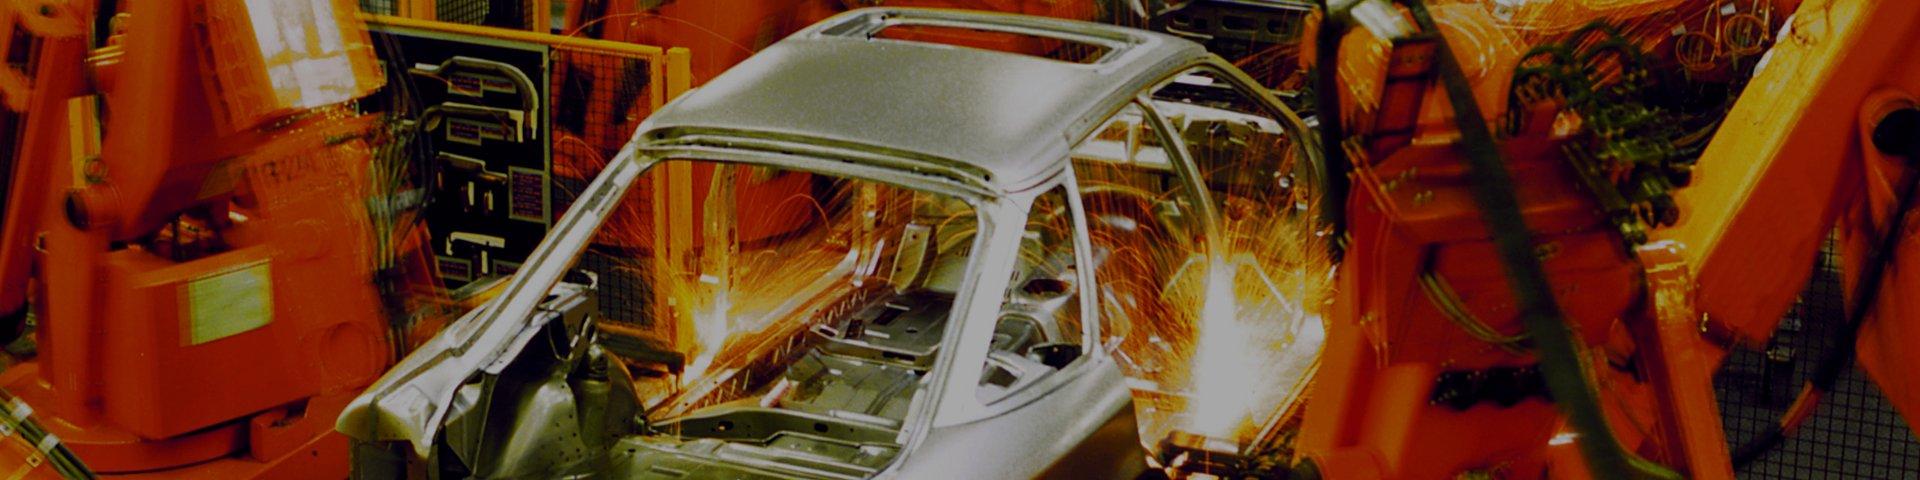 Society of Automotive Engineers Switzerland